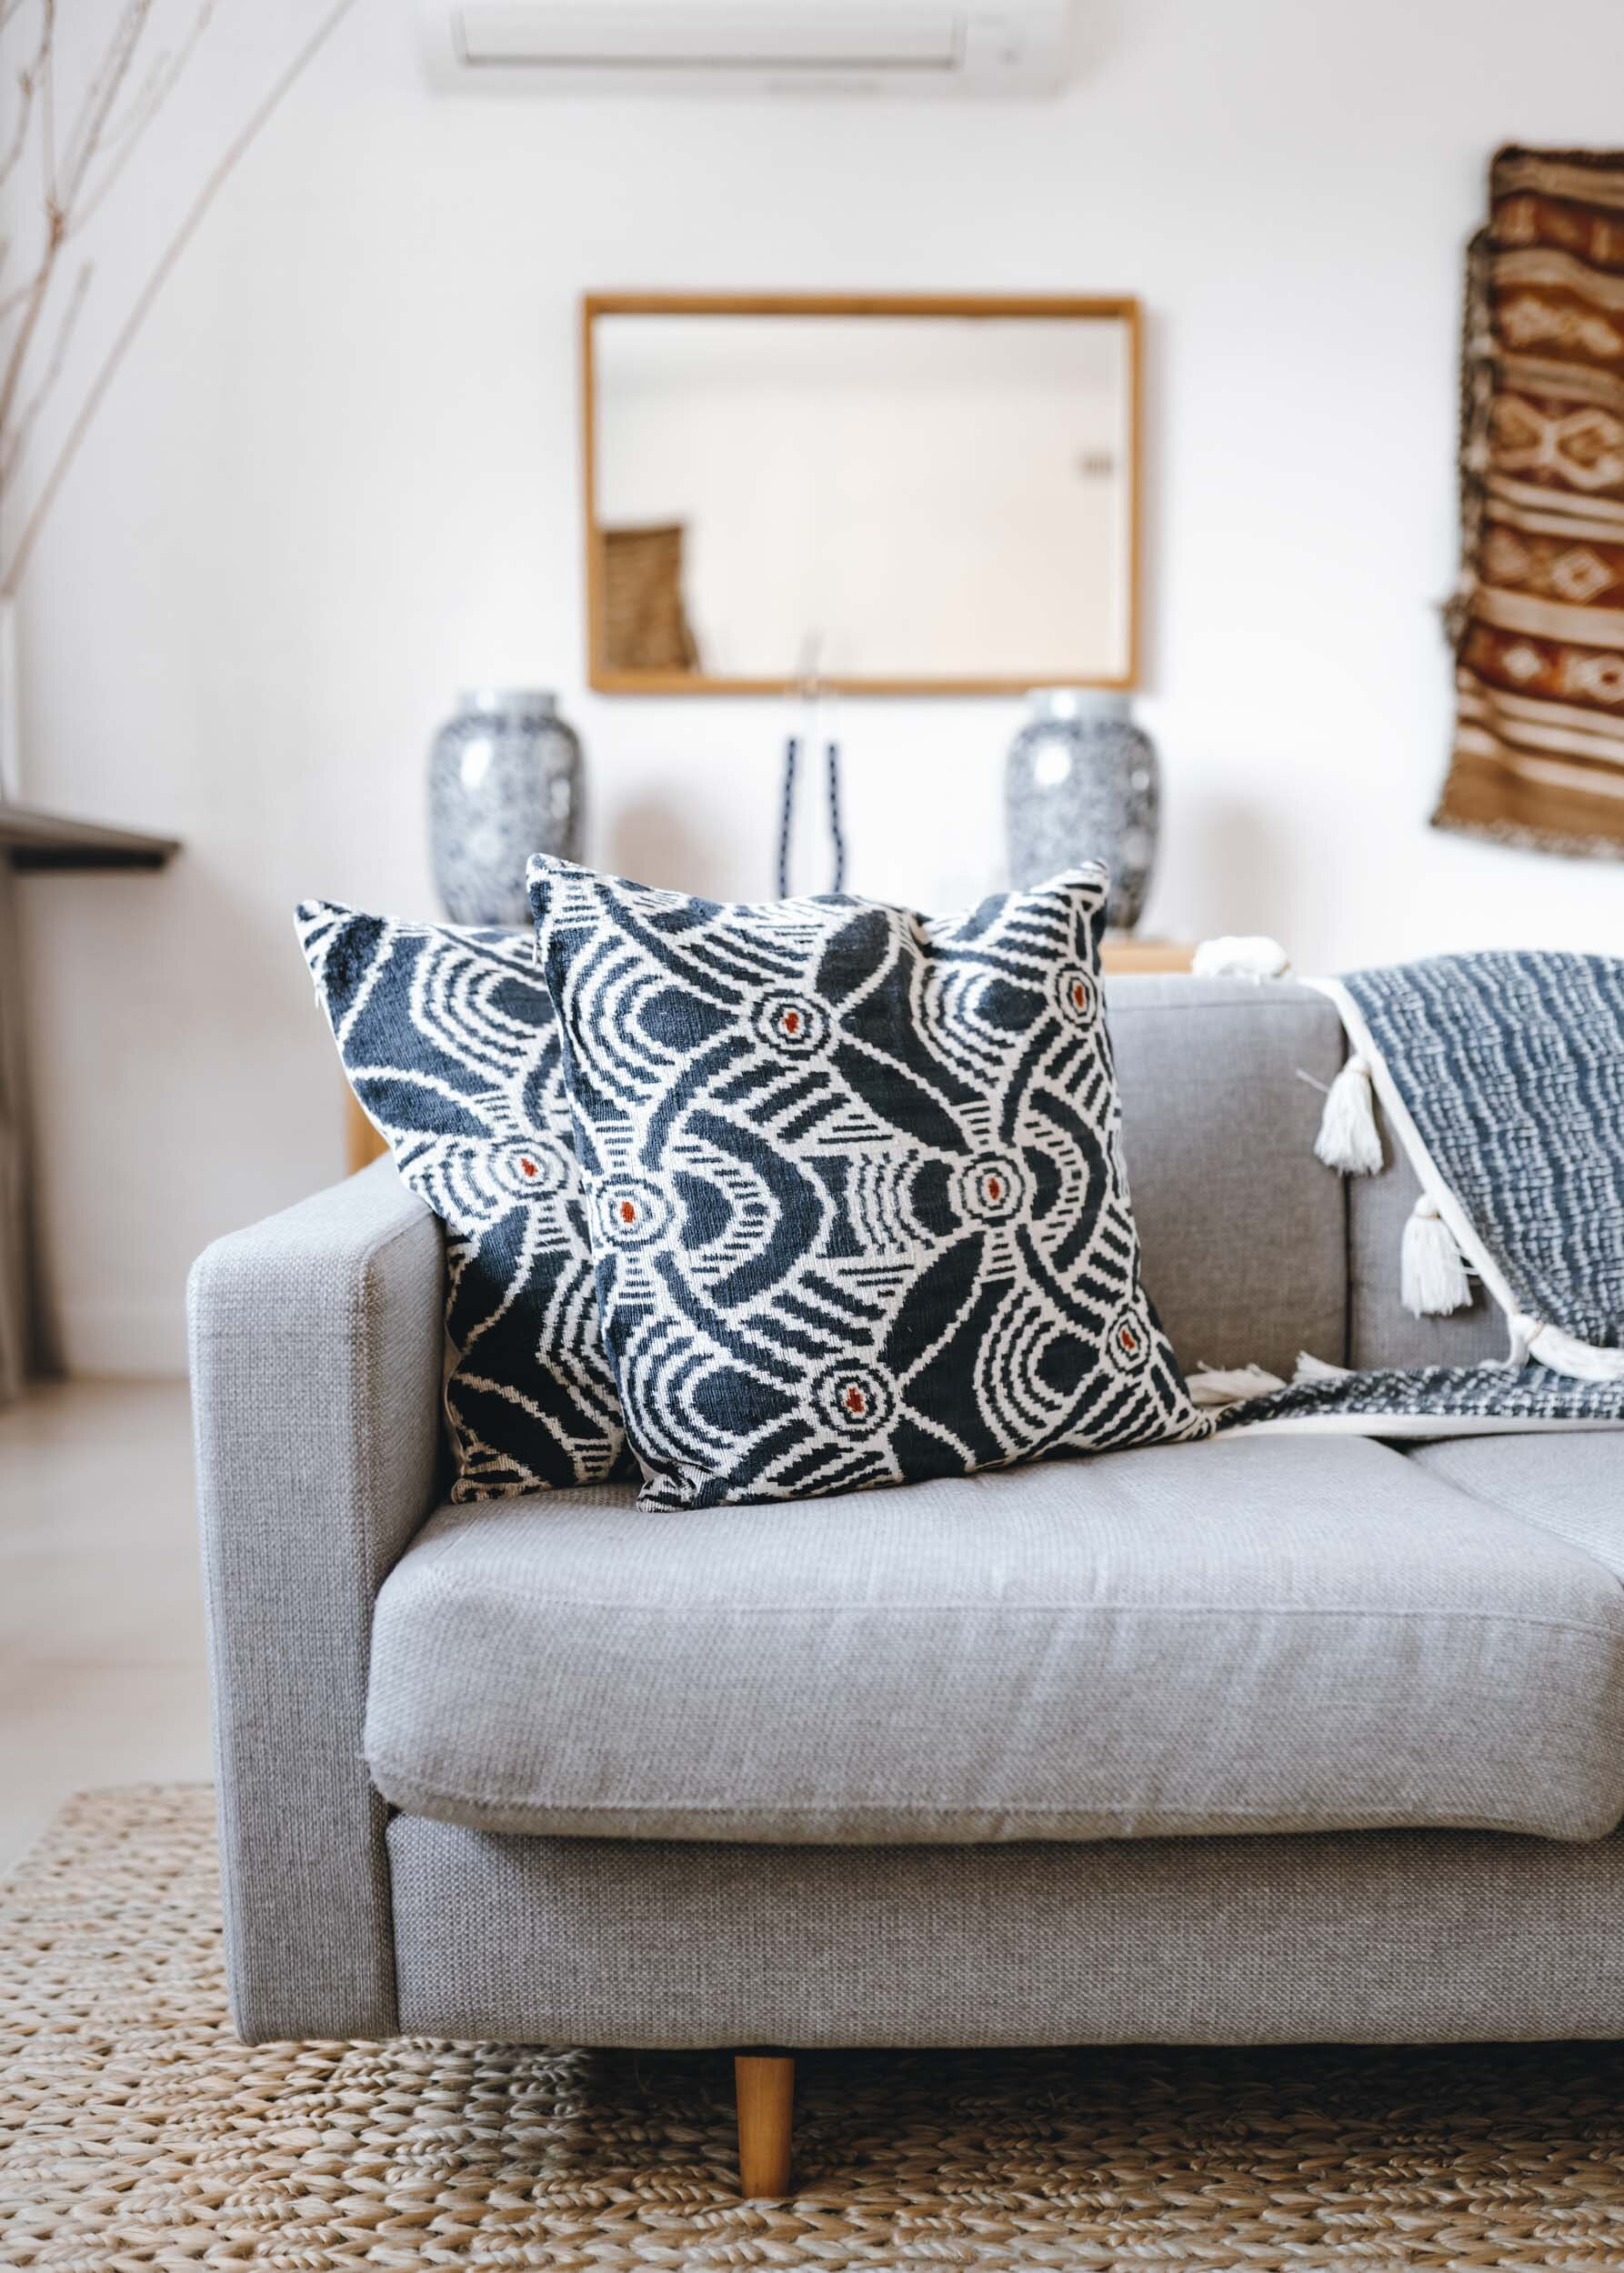 keira-mason-flourish-on-bull-street-lounge-cushions-blue.jpg